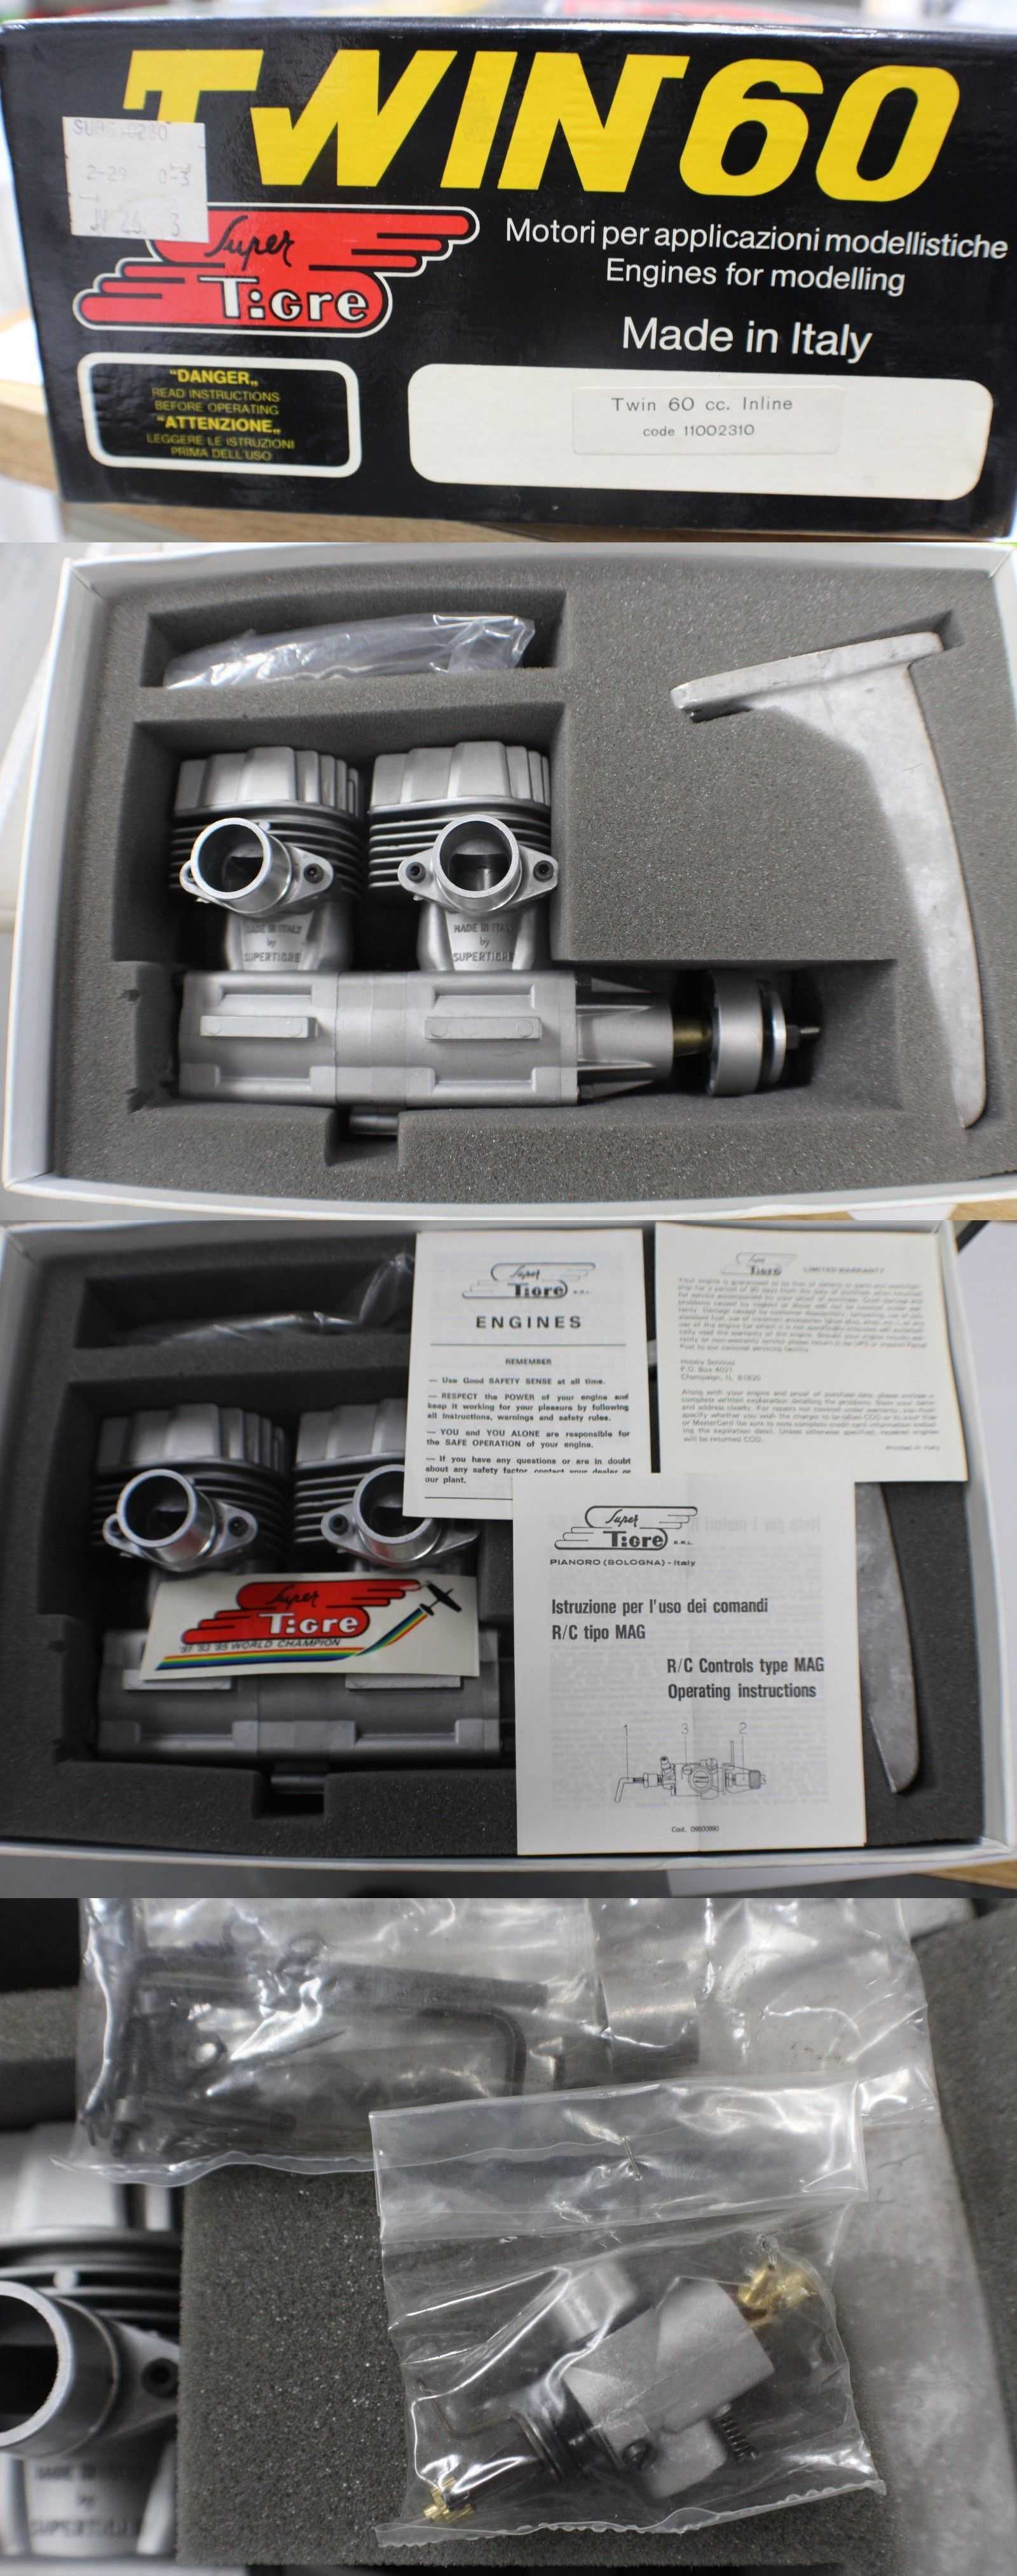 RC Plans Templates and Manuals 182212: Vintage Super Tigre Twin 60Cc